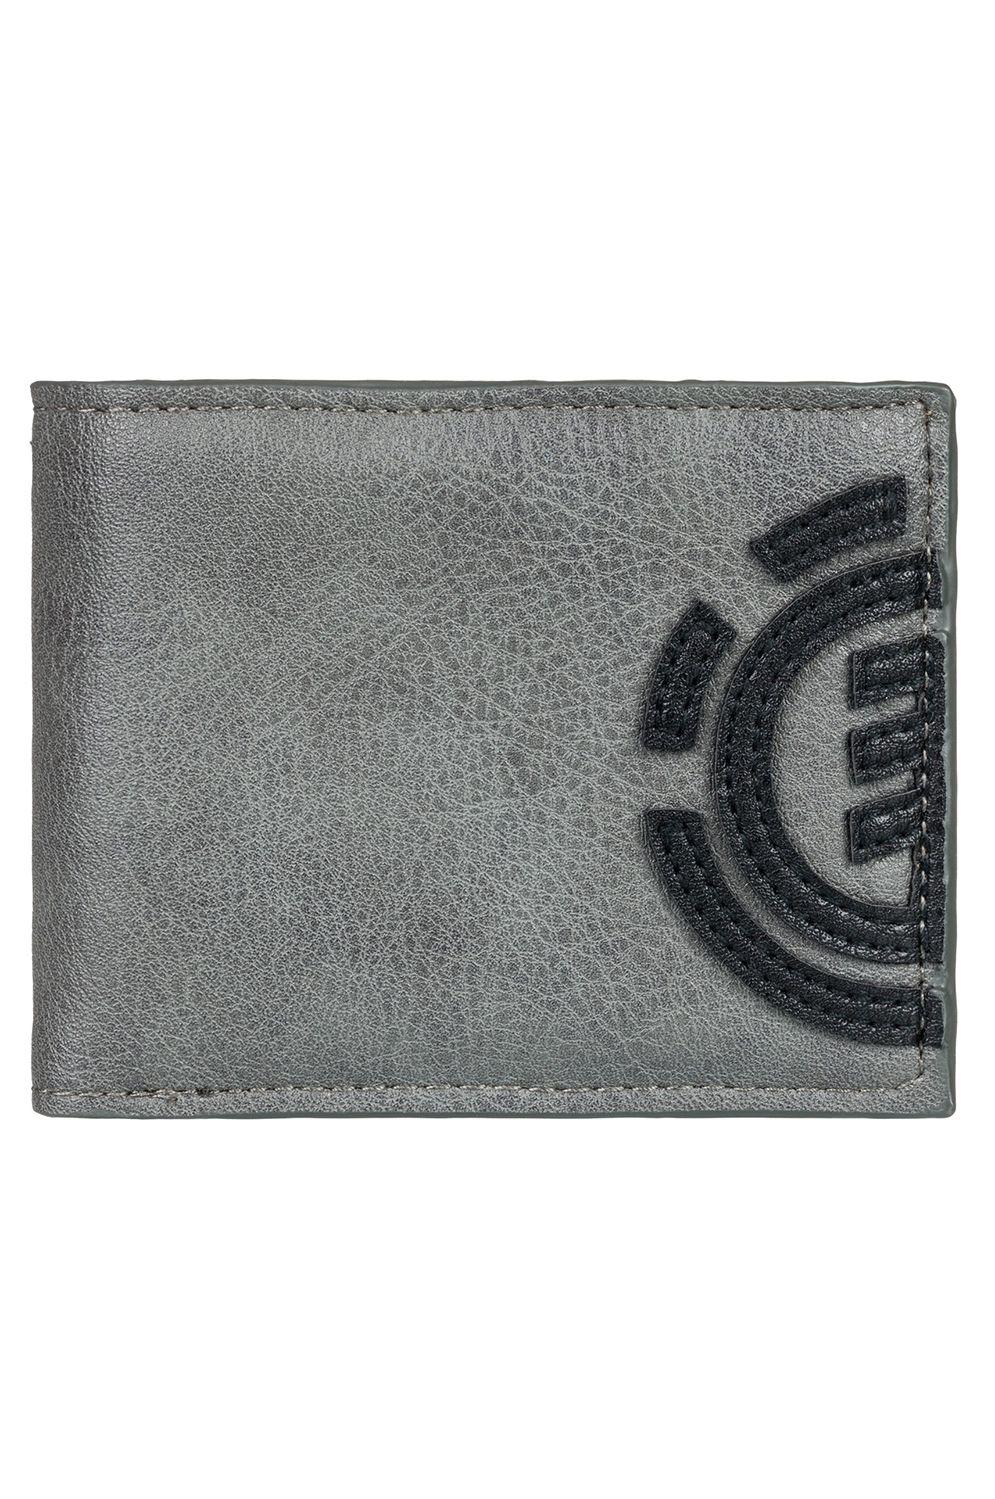 Element Wallet PU  DAILY WALLET Steeple Gray